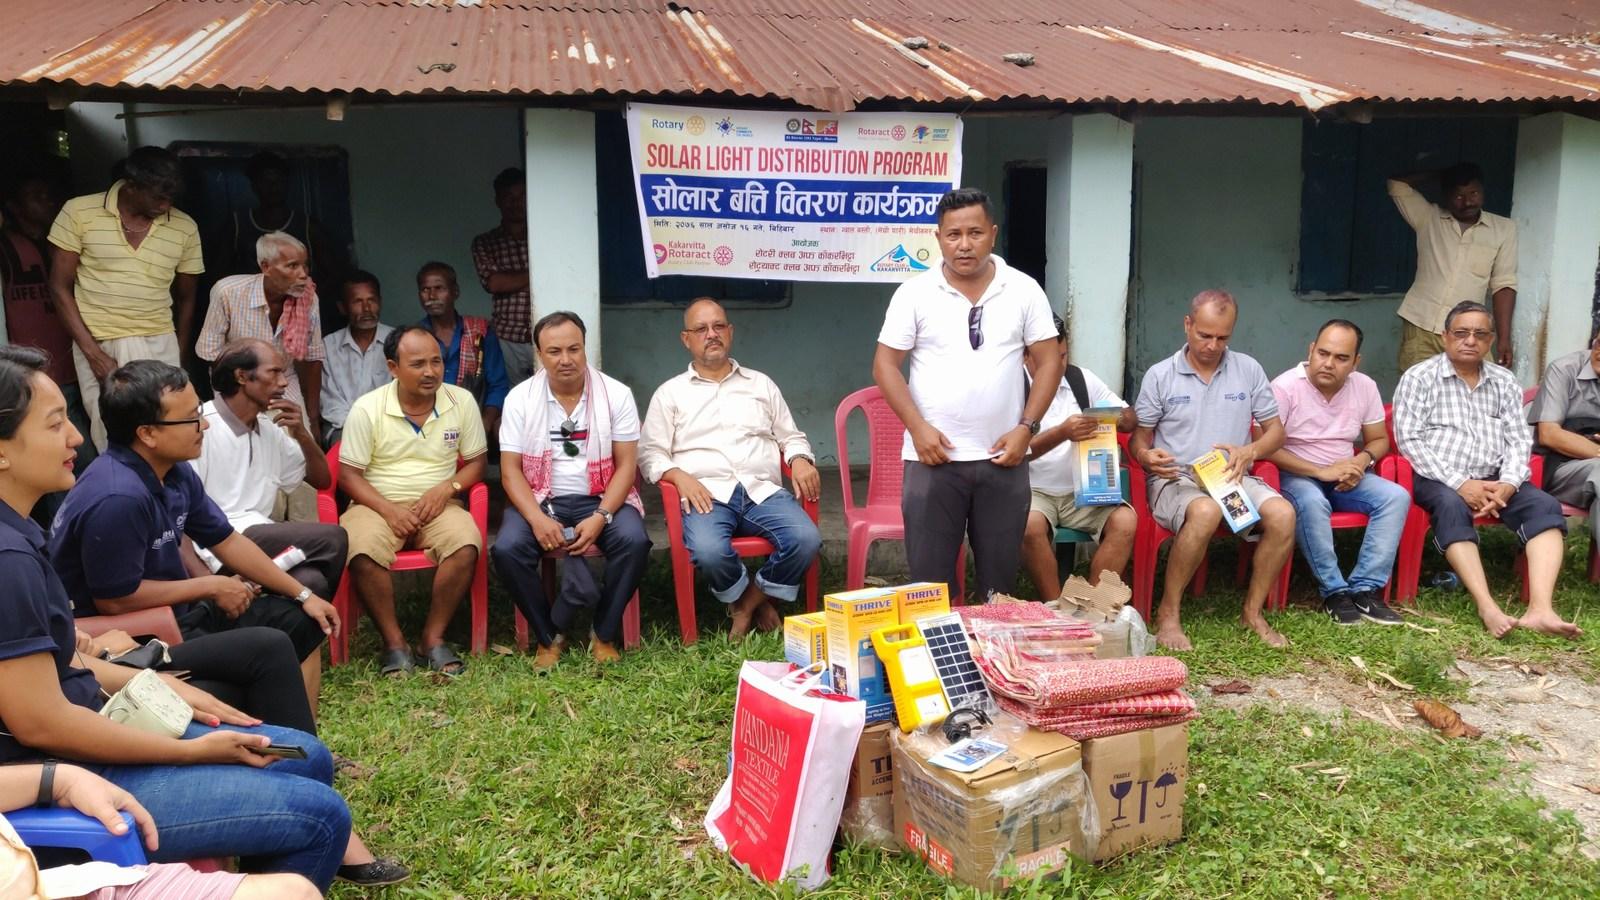 Solar-Light-Distribution-Program-Rotary-Club-of-Kakarvitta-5